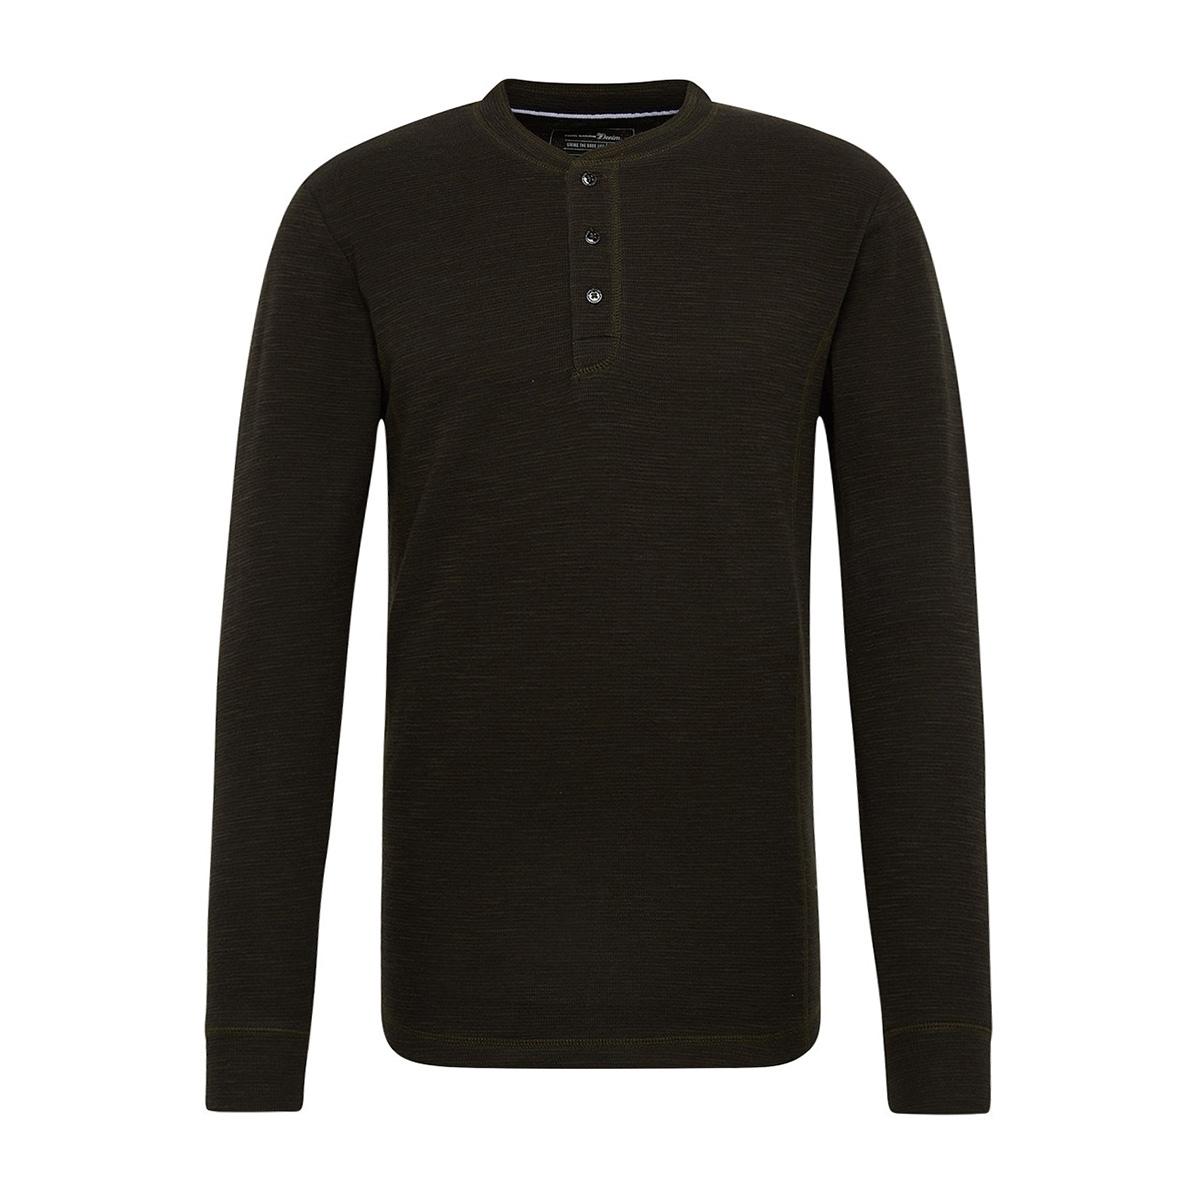 1006969xx12 tom tailor t-shirt 14692